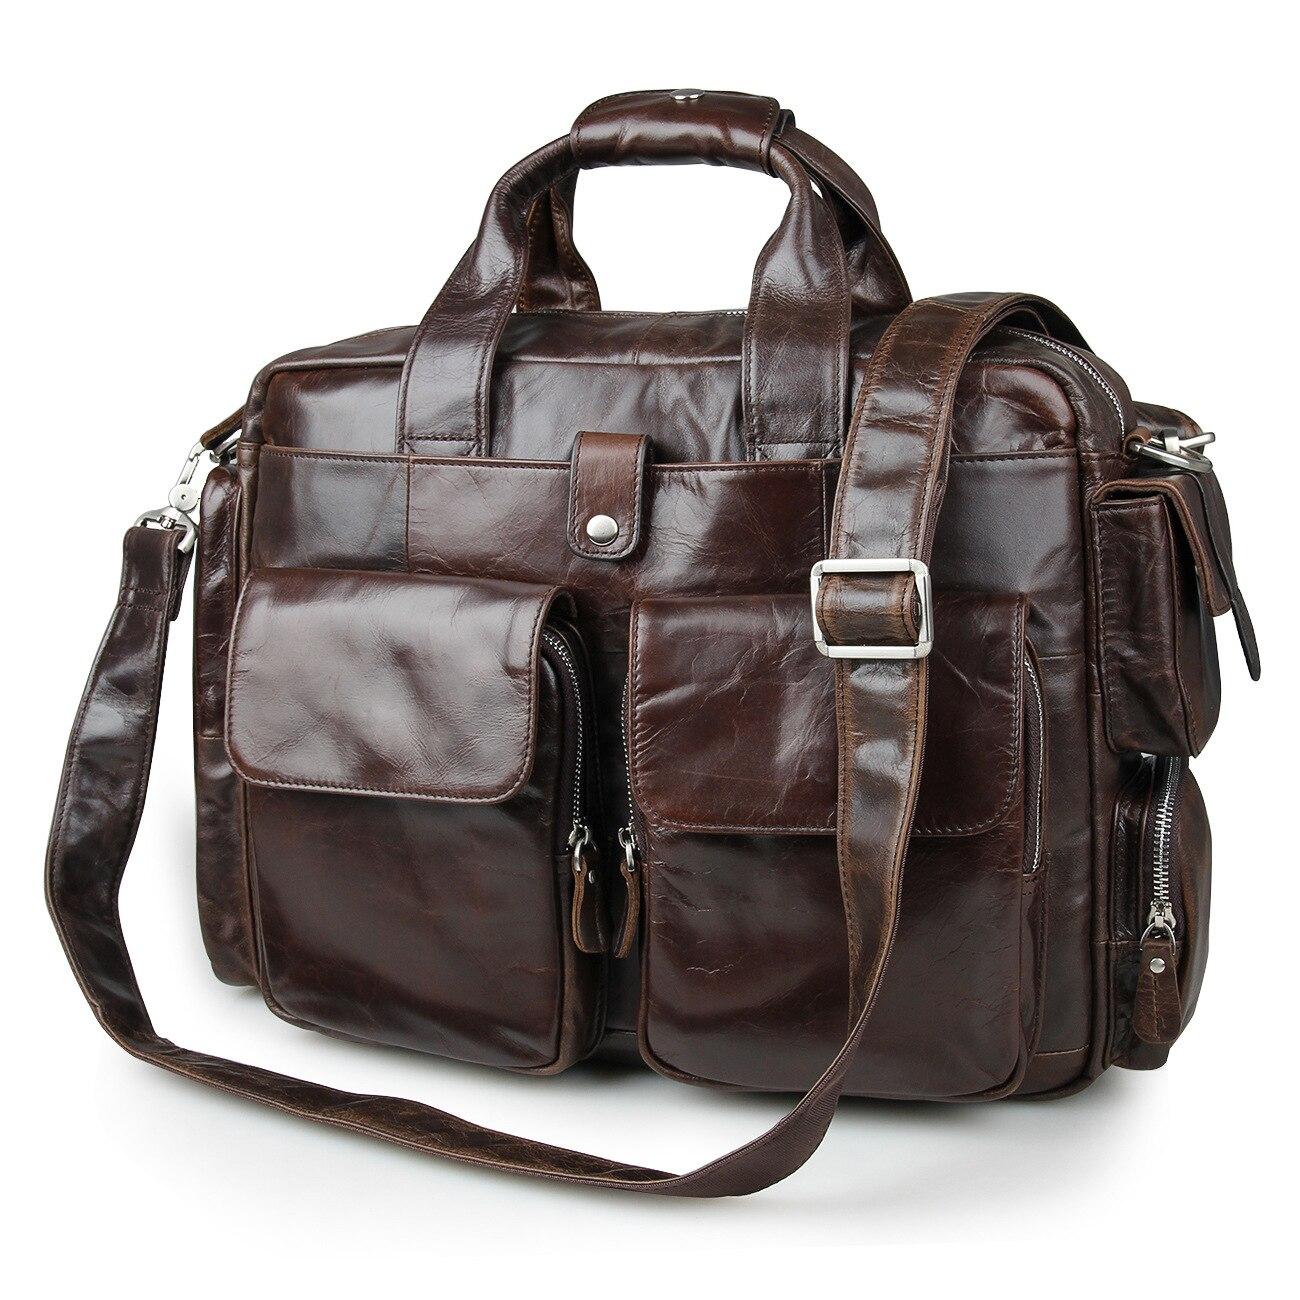 2016 Top Time limited Oil Wax Leather Bag Men Handbags Cowhide Genuine Crossbody Men s Travel